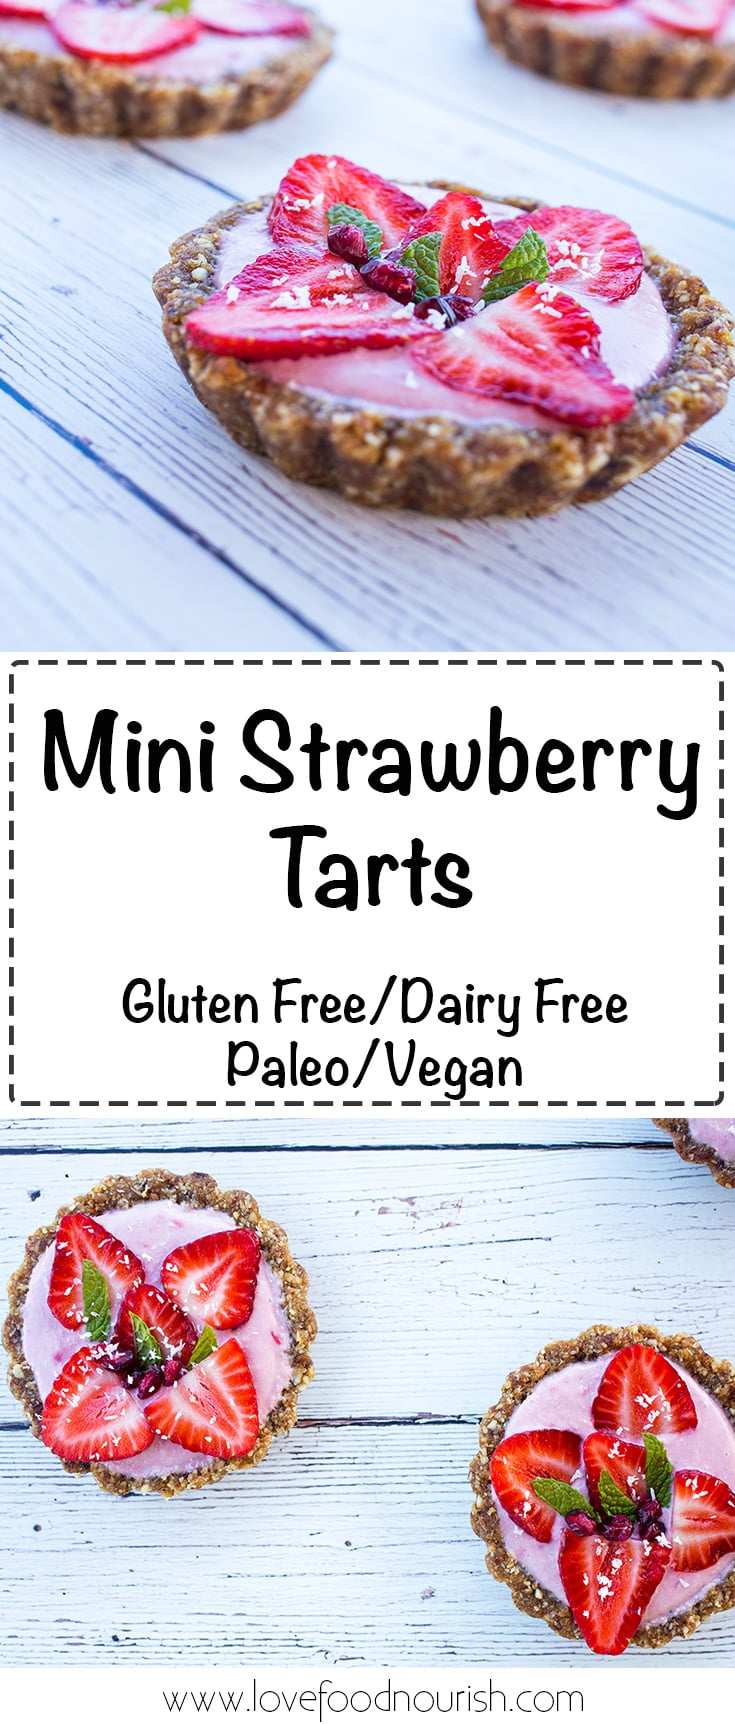 Mini Strawberry Tarts - Fresh, fruity & creamy these gluten free & paleo strawberry tarts are full of fresh strawberry flavor. No baking required! #paleo #paleodessert #vegan #gluten free #glutenfreedessert #strawberries #tart #dairyfree